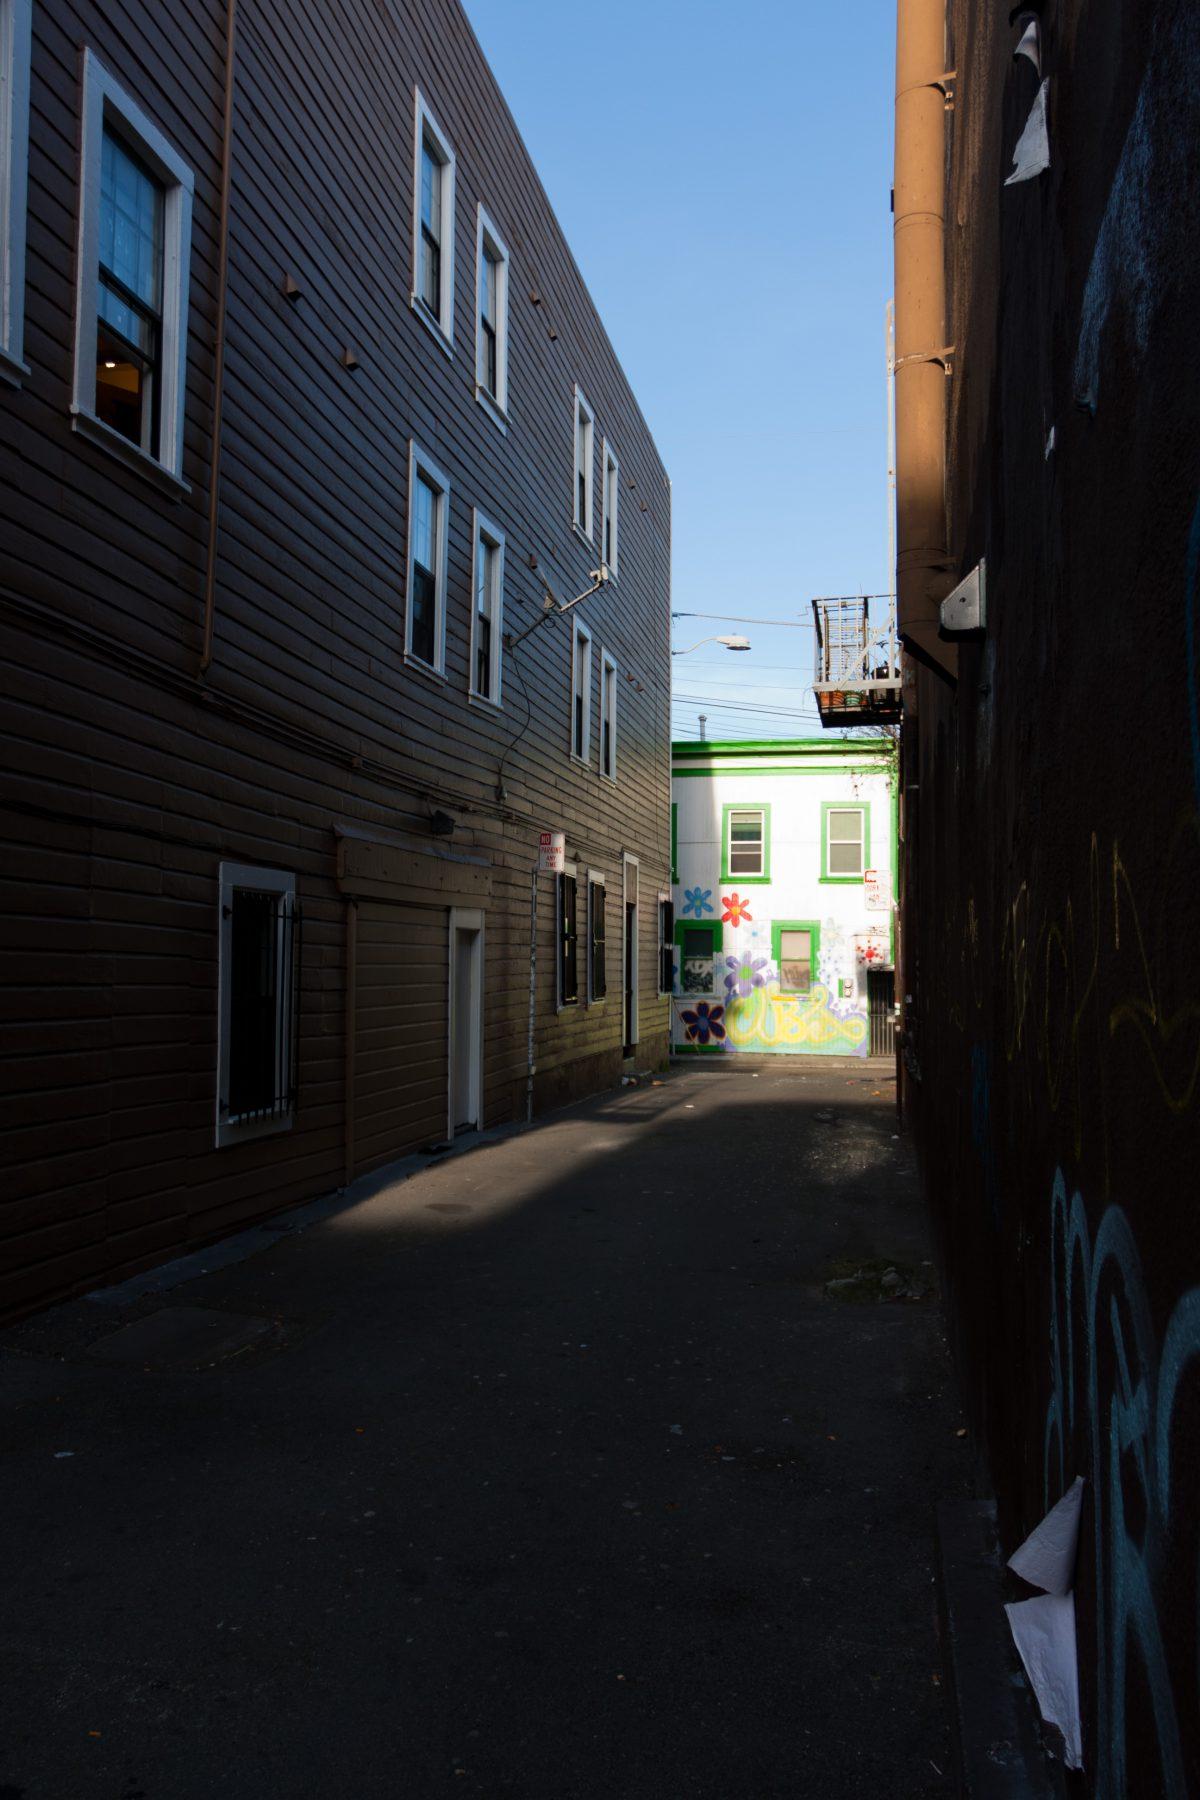 Back alley - around Misiion, alley, graffiti